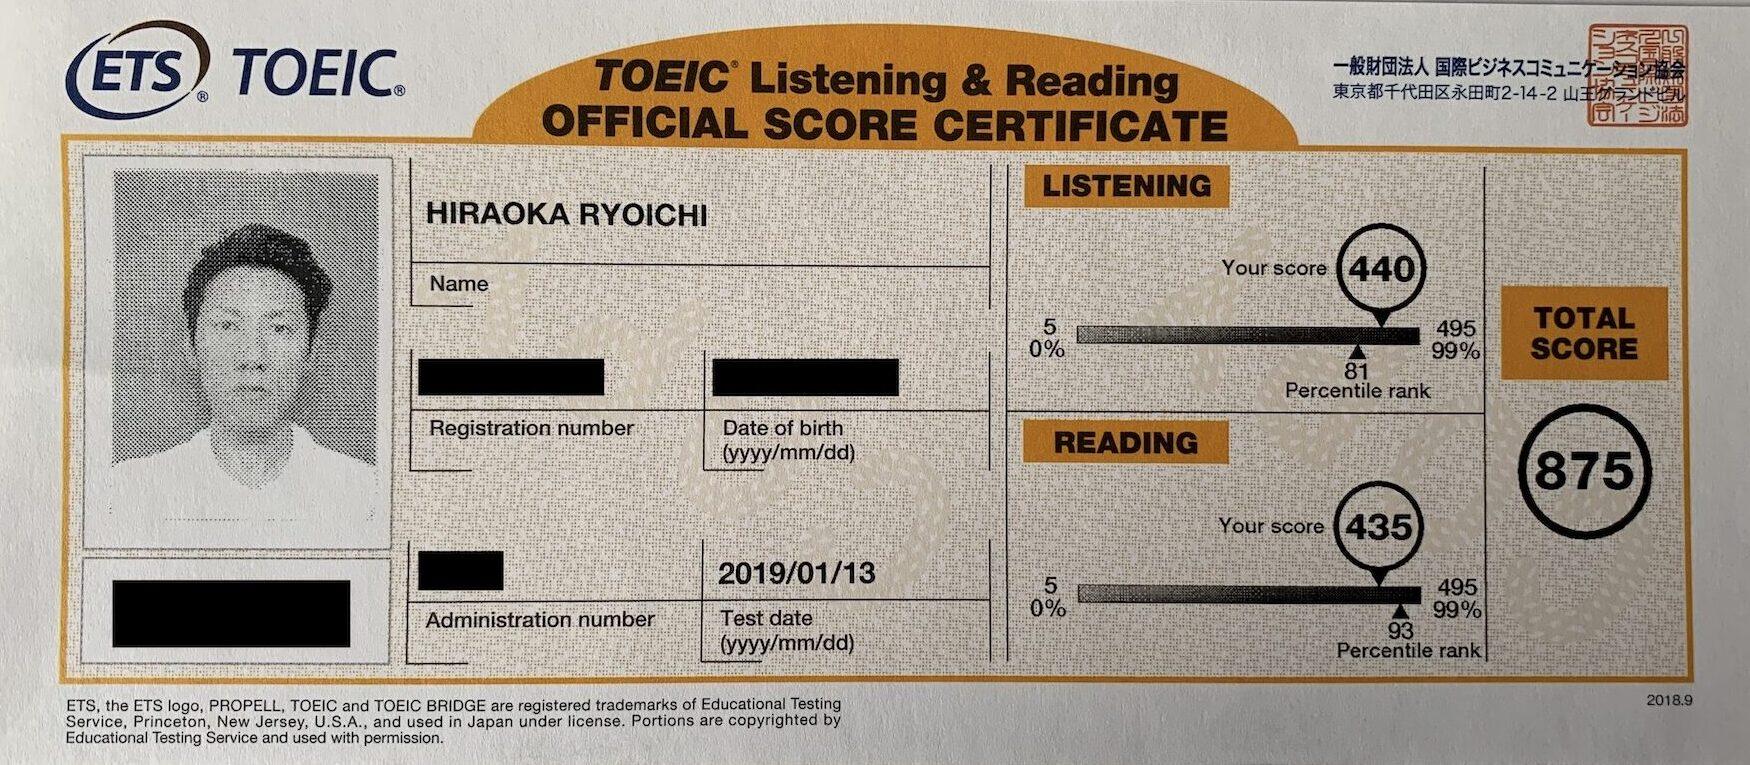 TOEIC600点台から875点まで伸ばした勉強方法